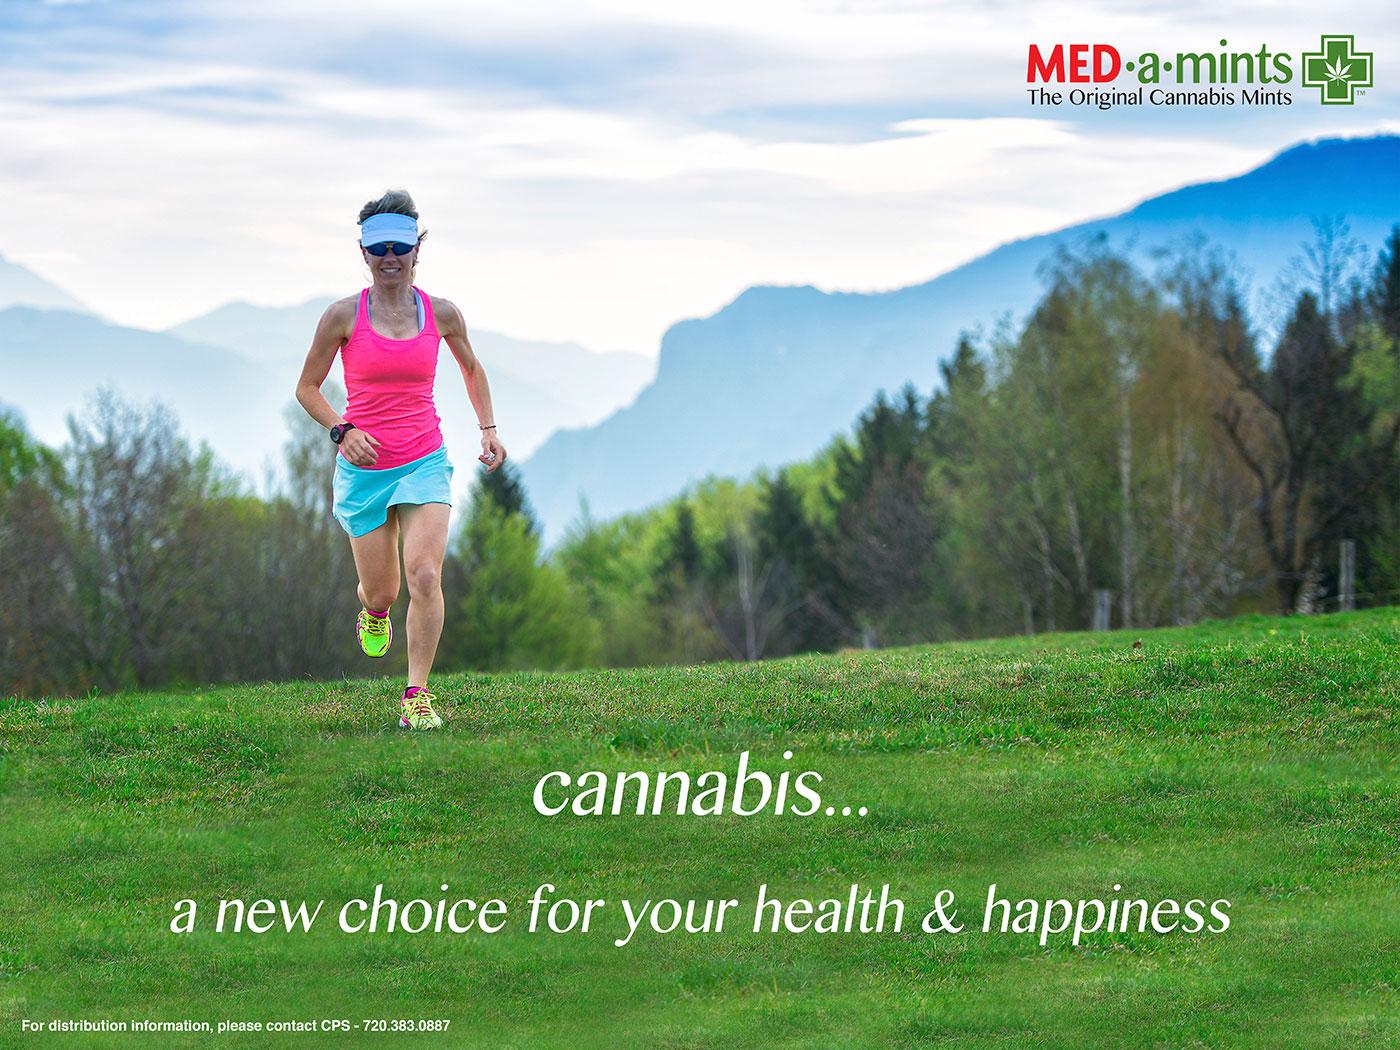 medamints-yay-cannabis-running-woman-web